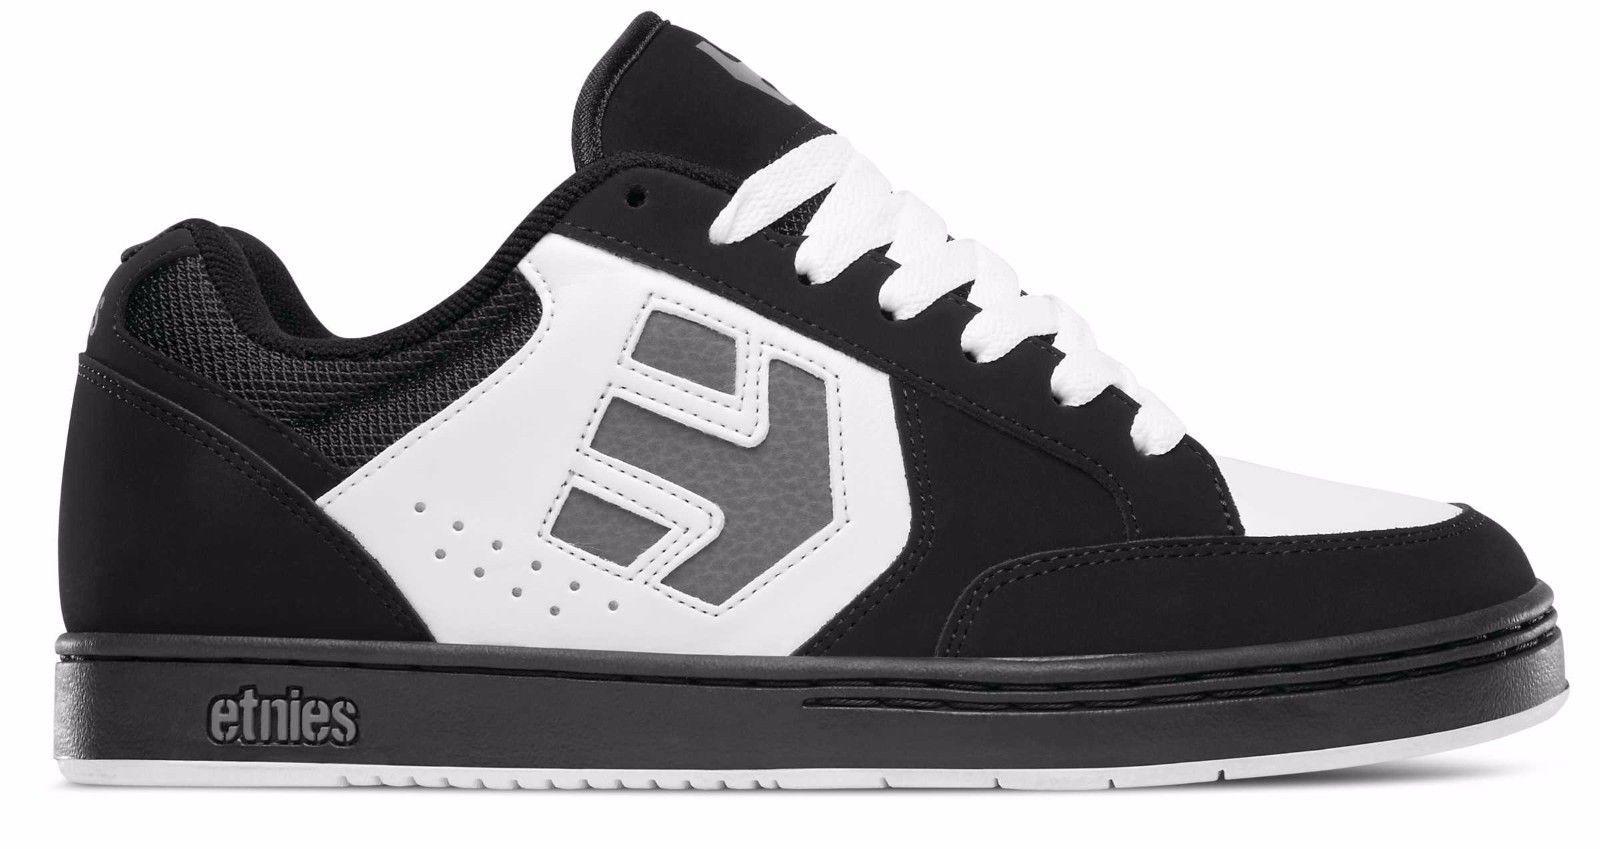 cdf03777579 Mens Etnies Swivel Skateboarding Shoes Nib and 50 similar items